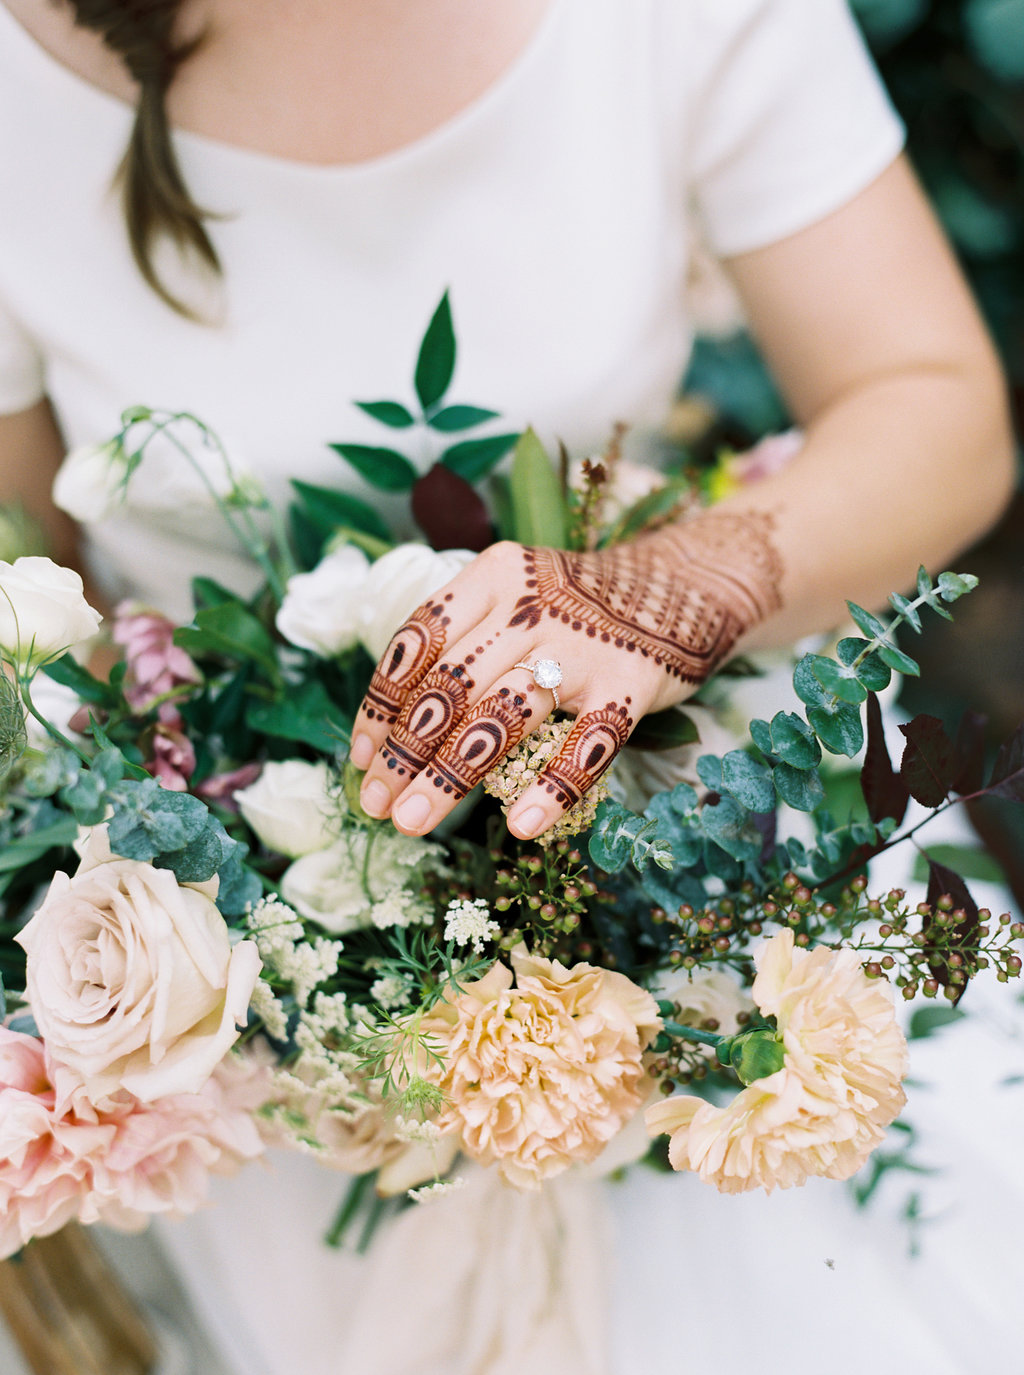 Rachel Slauer Atlanta Southeast Wedding Planning Design Indian Spring Bouquet Style Me Pretty 04.jpg